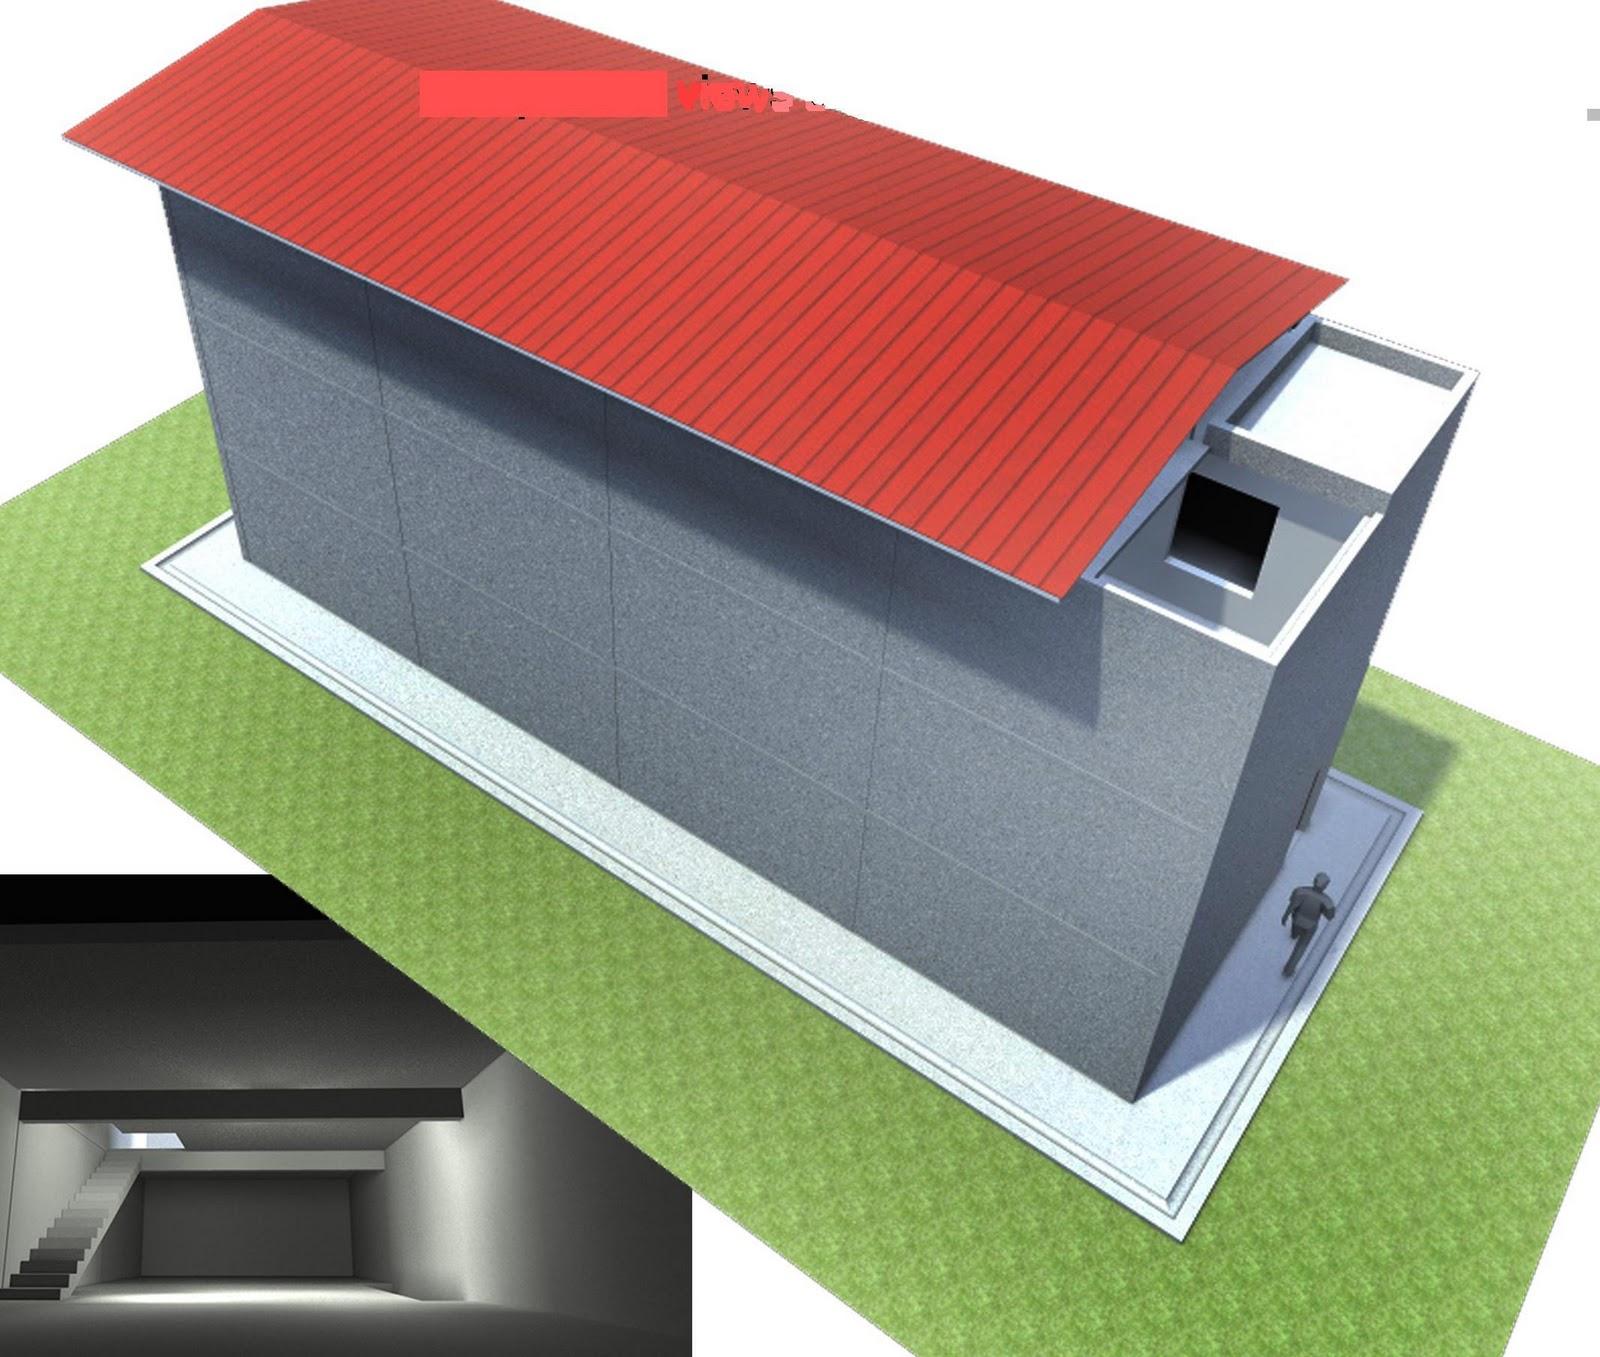 45 Gambar Desain Rumah Walet Lubang Naga HD Paling Keren